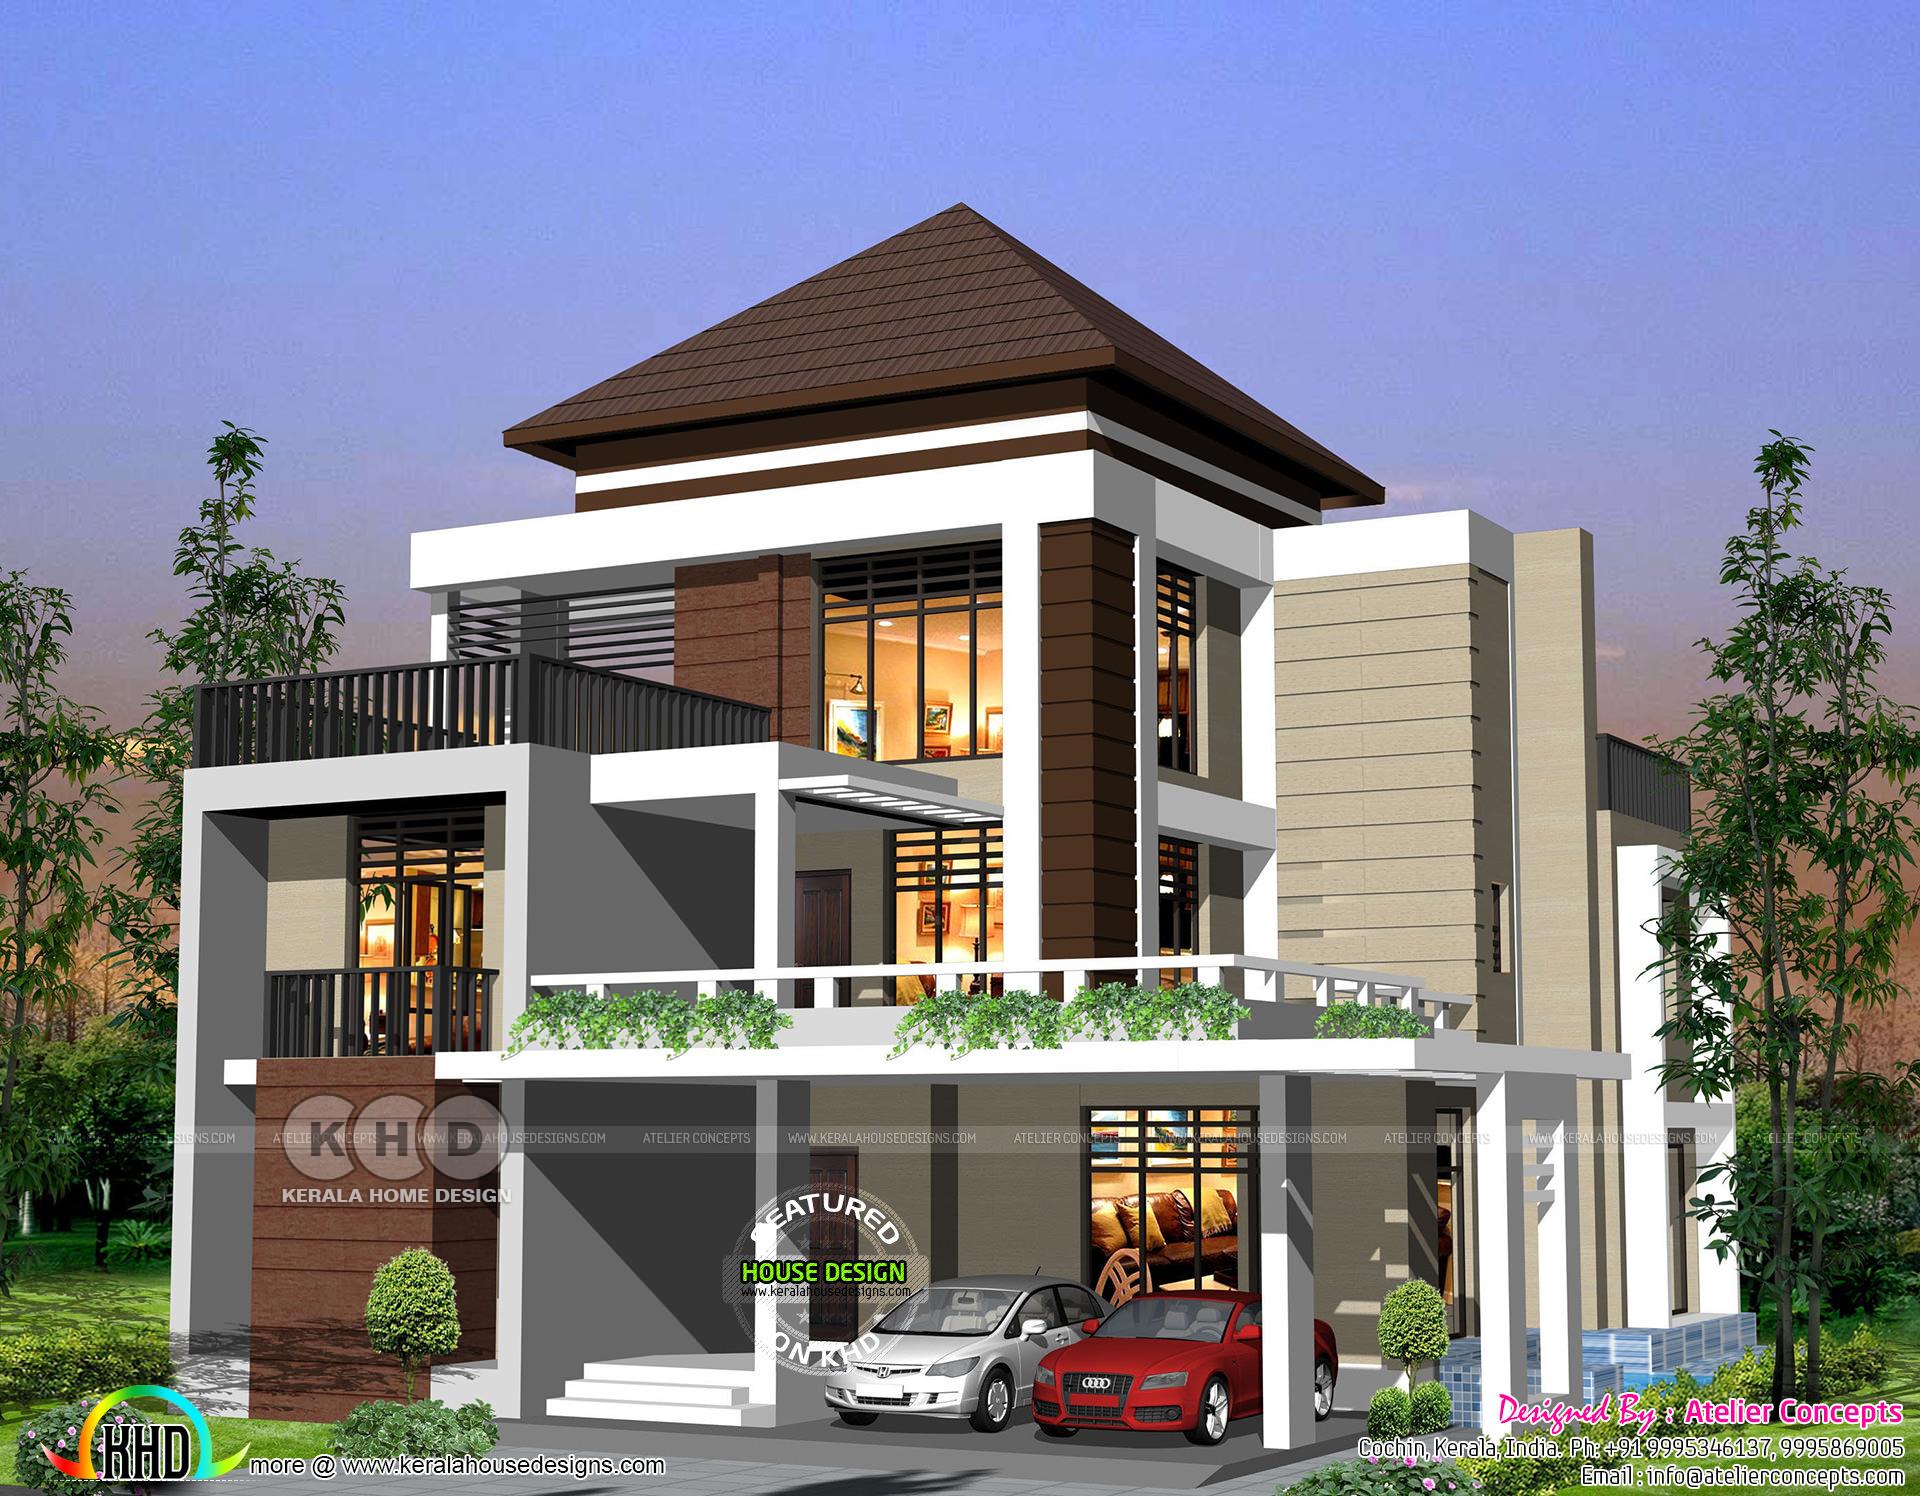 4 BHK Modern house plan 3300 square feet | Kerala home ... Kerala House Plans Sq Ft on 4800 sq ft house plans, 1000 sq ft house plans, 500 sq ft house plans, 4000 sq ft house plans, 1800 sq ft house plans, 1300 sq ft house plans, 1150 sq ft house plans, 1148 sq ft house plans, 720 sq ft house plans, 600 sq ft house plans, 10000 sq ft house plans, 832 sq ft house plans, 300 sq ft house plans, 400 sq ft house plans, 1200 sq ft house plans, 900 sq ft house plans, 1035 sq ft house plans, 3100 sq ft house plans, 30000 sq ft house plans, 200 sq ft house plans,